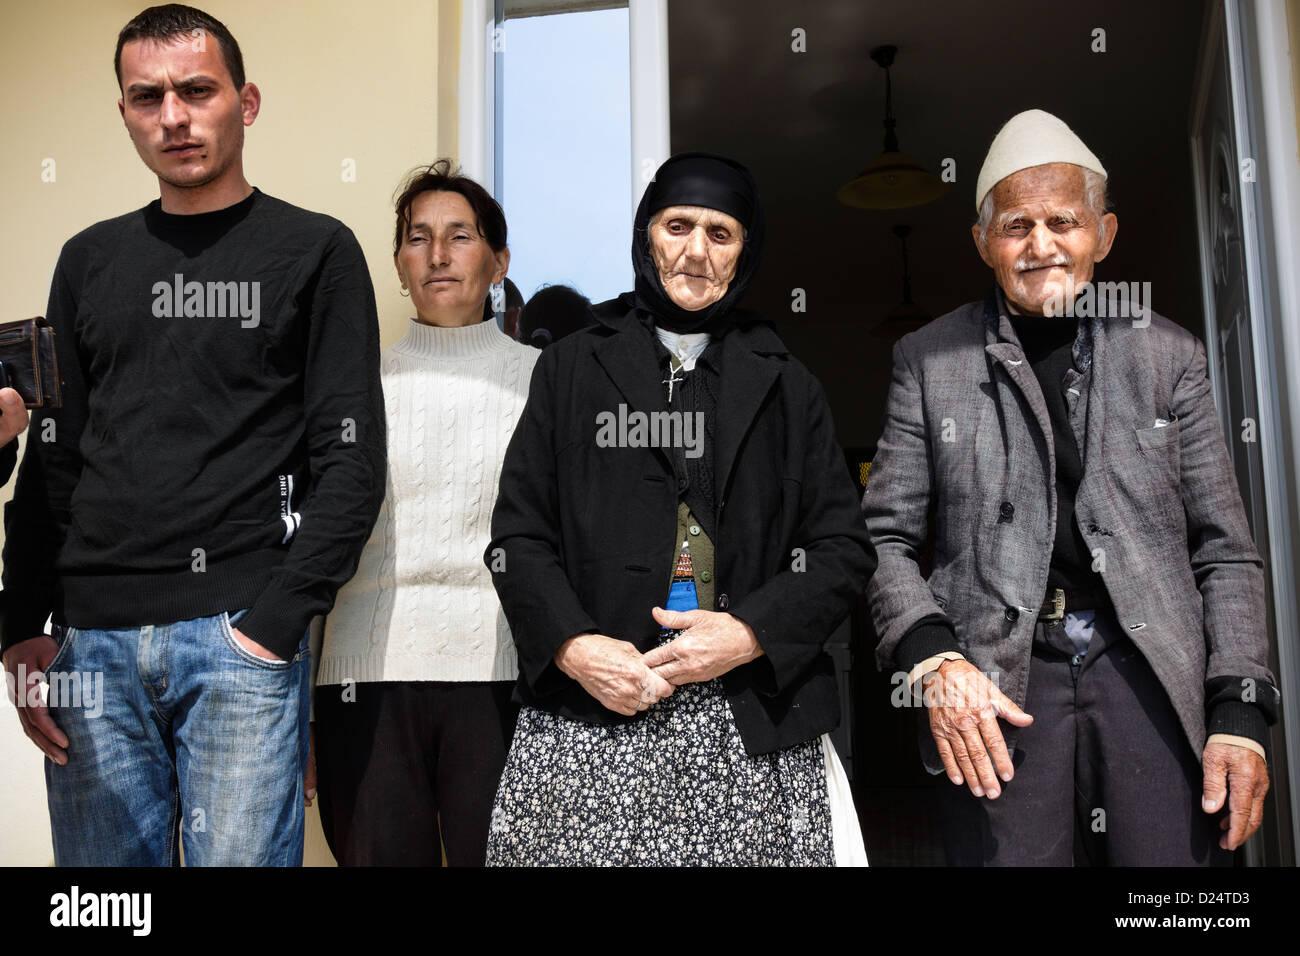 Albanian family living locked at home under the threat of a Kanun blood feud. Near Tirana, Albania - Stock Image